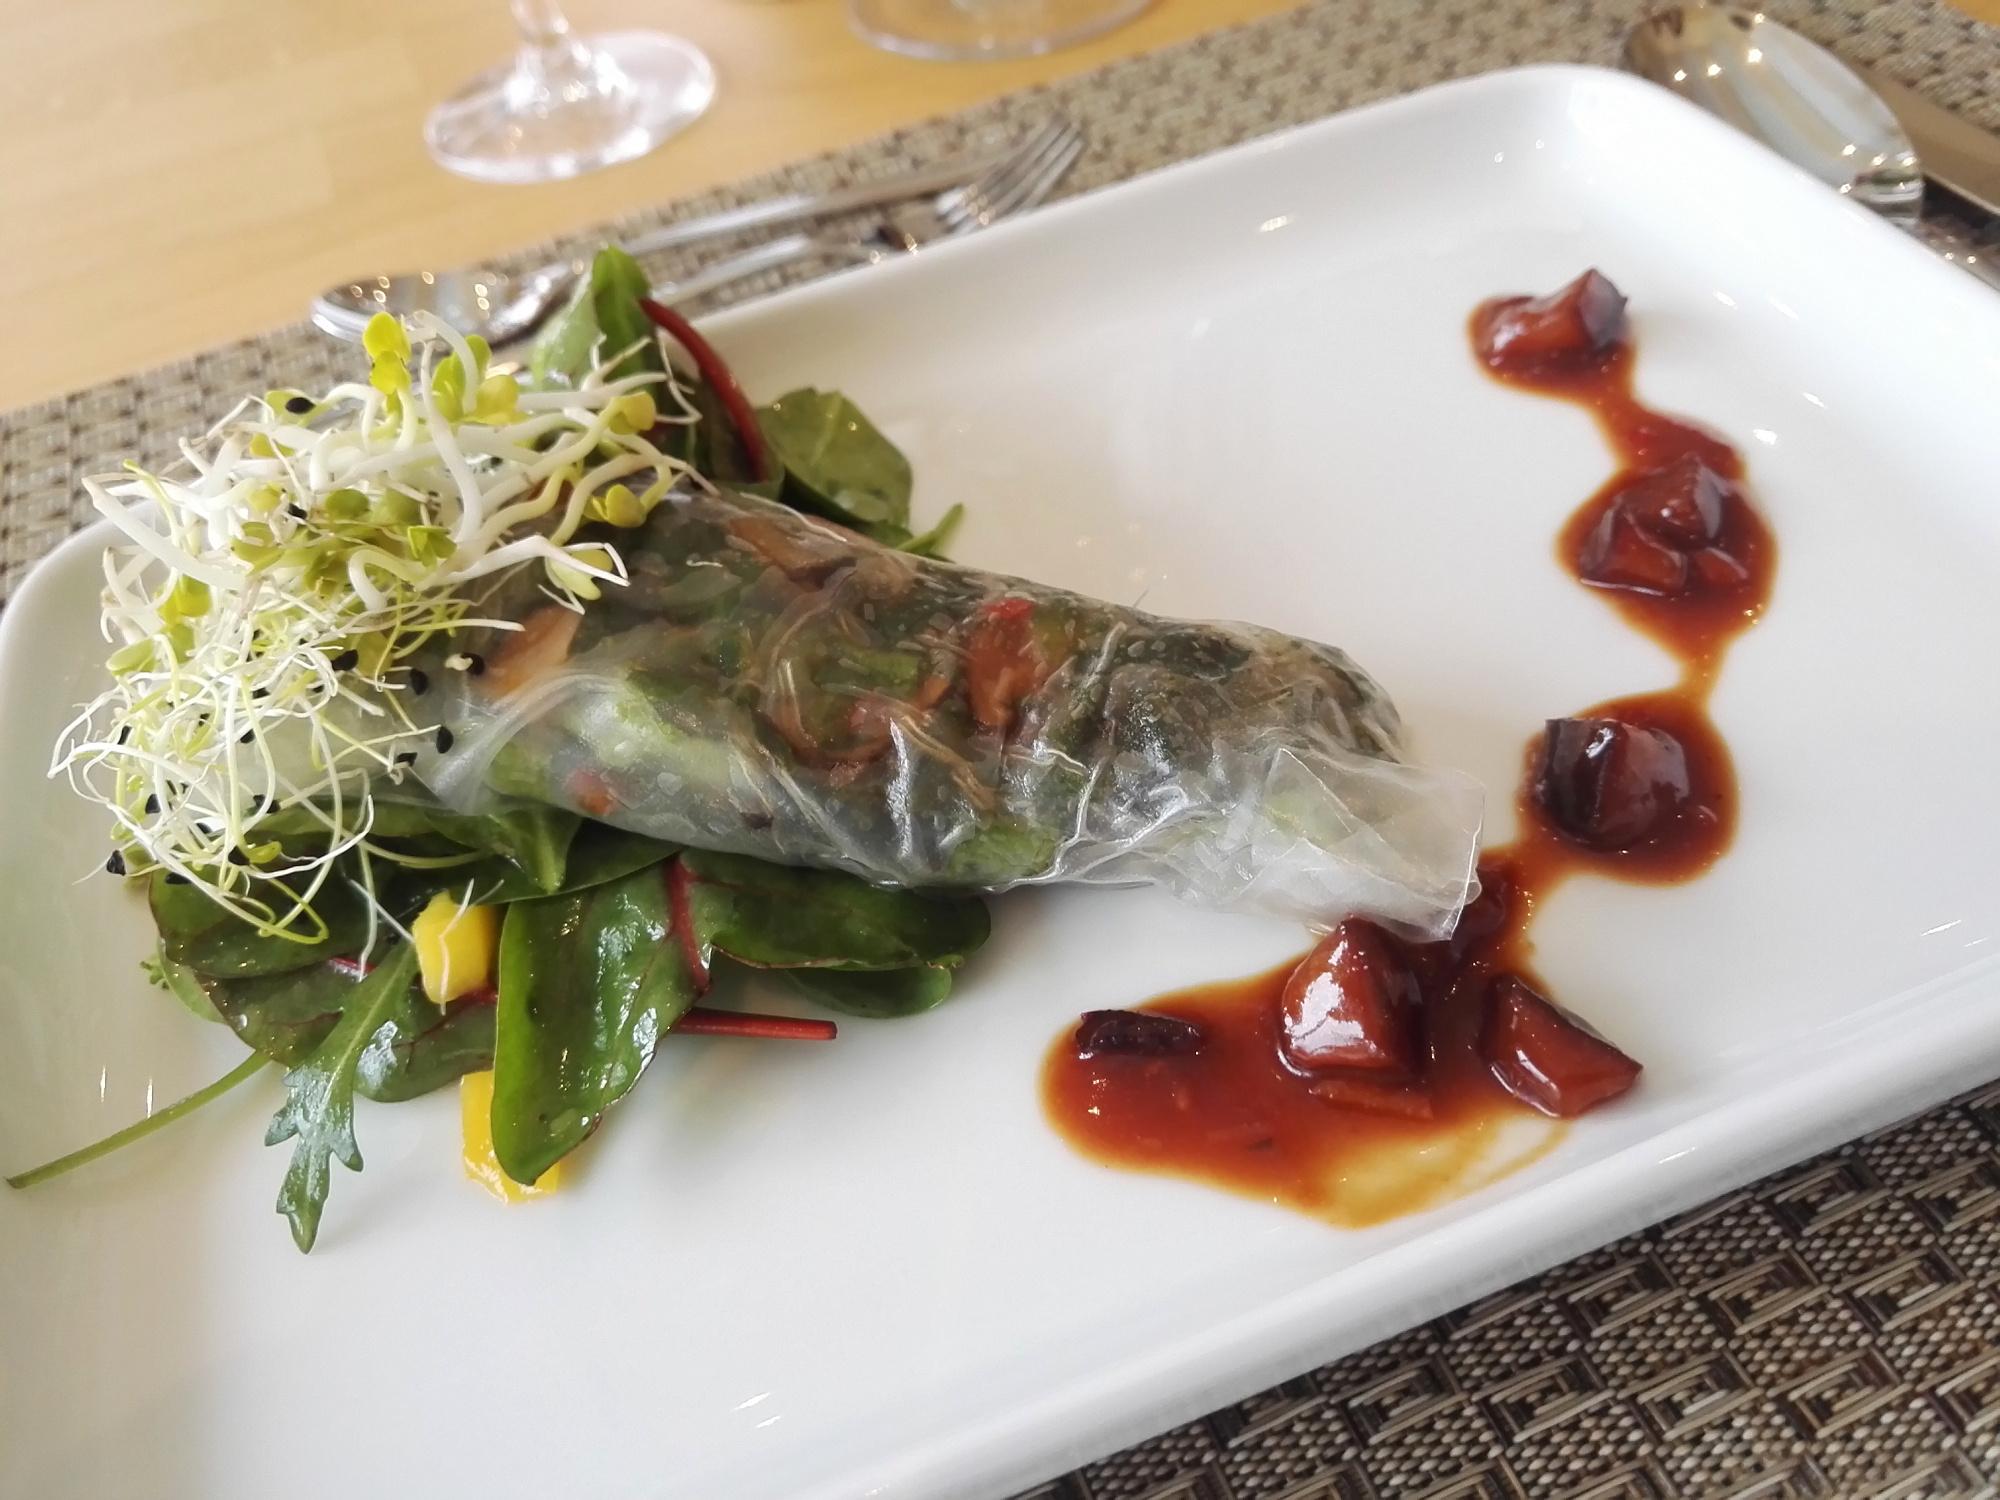 Kochkurs: Vegetarisch asiatisch